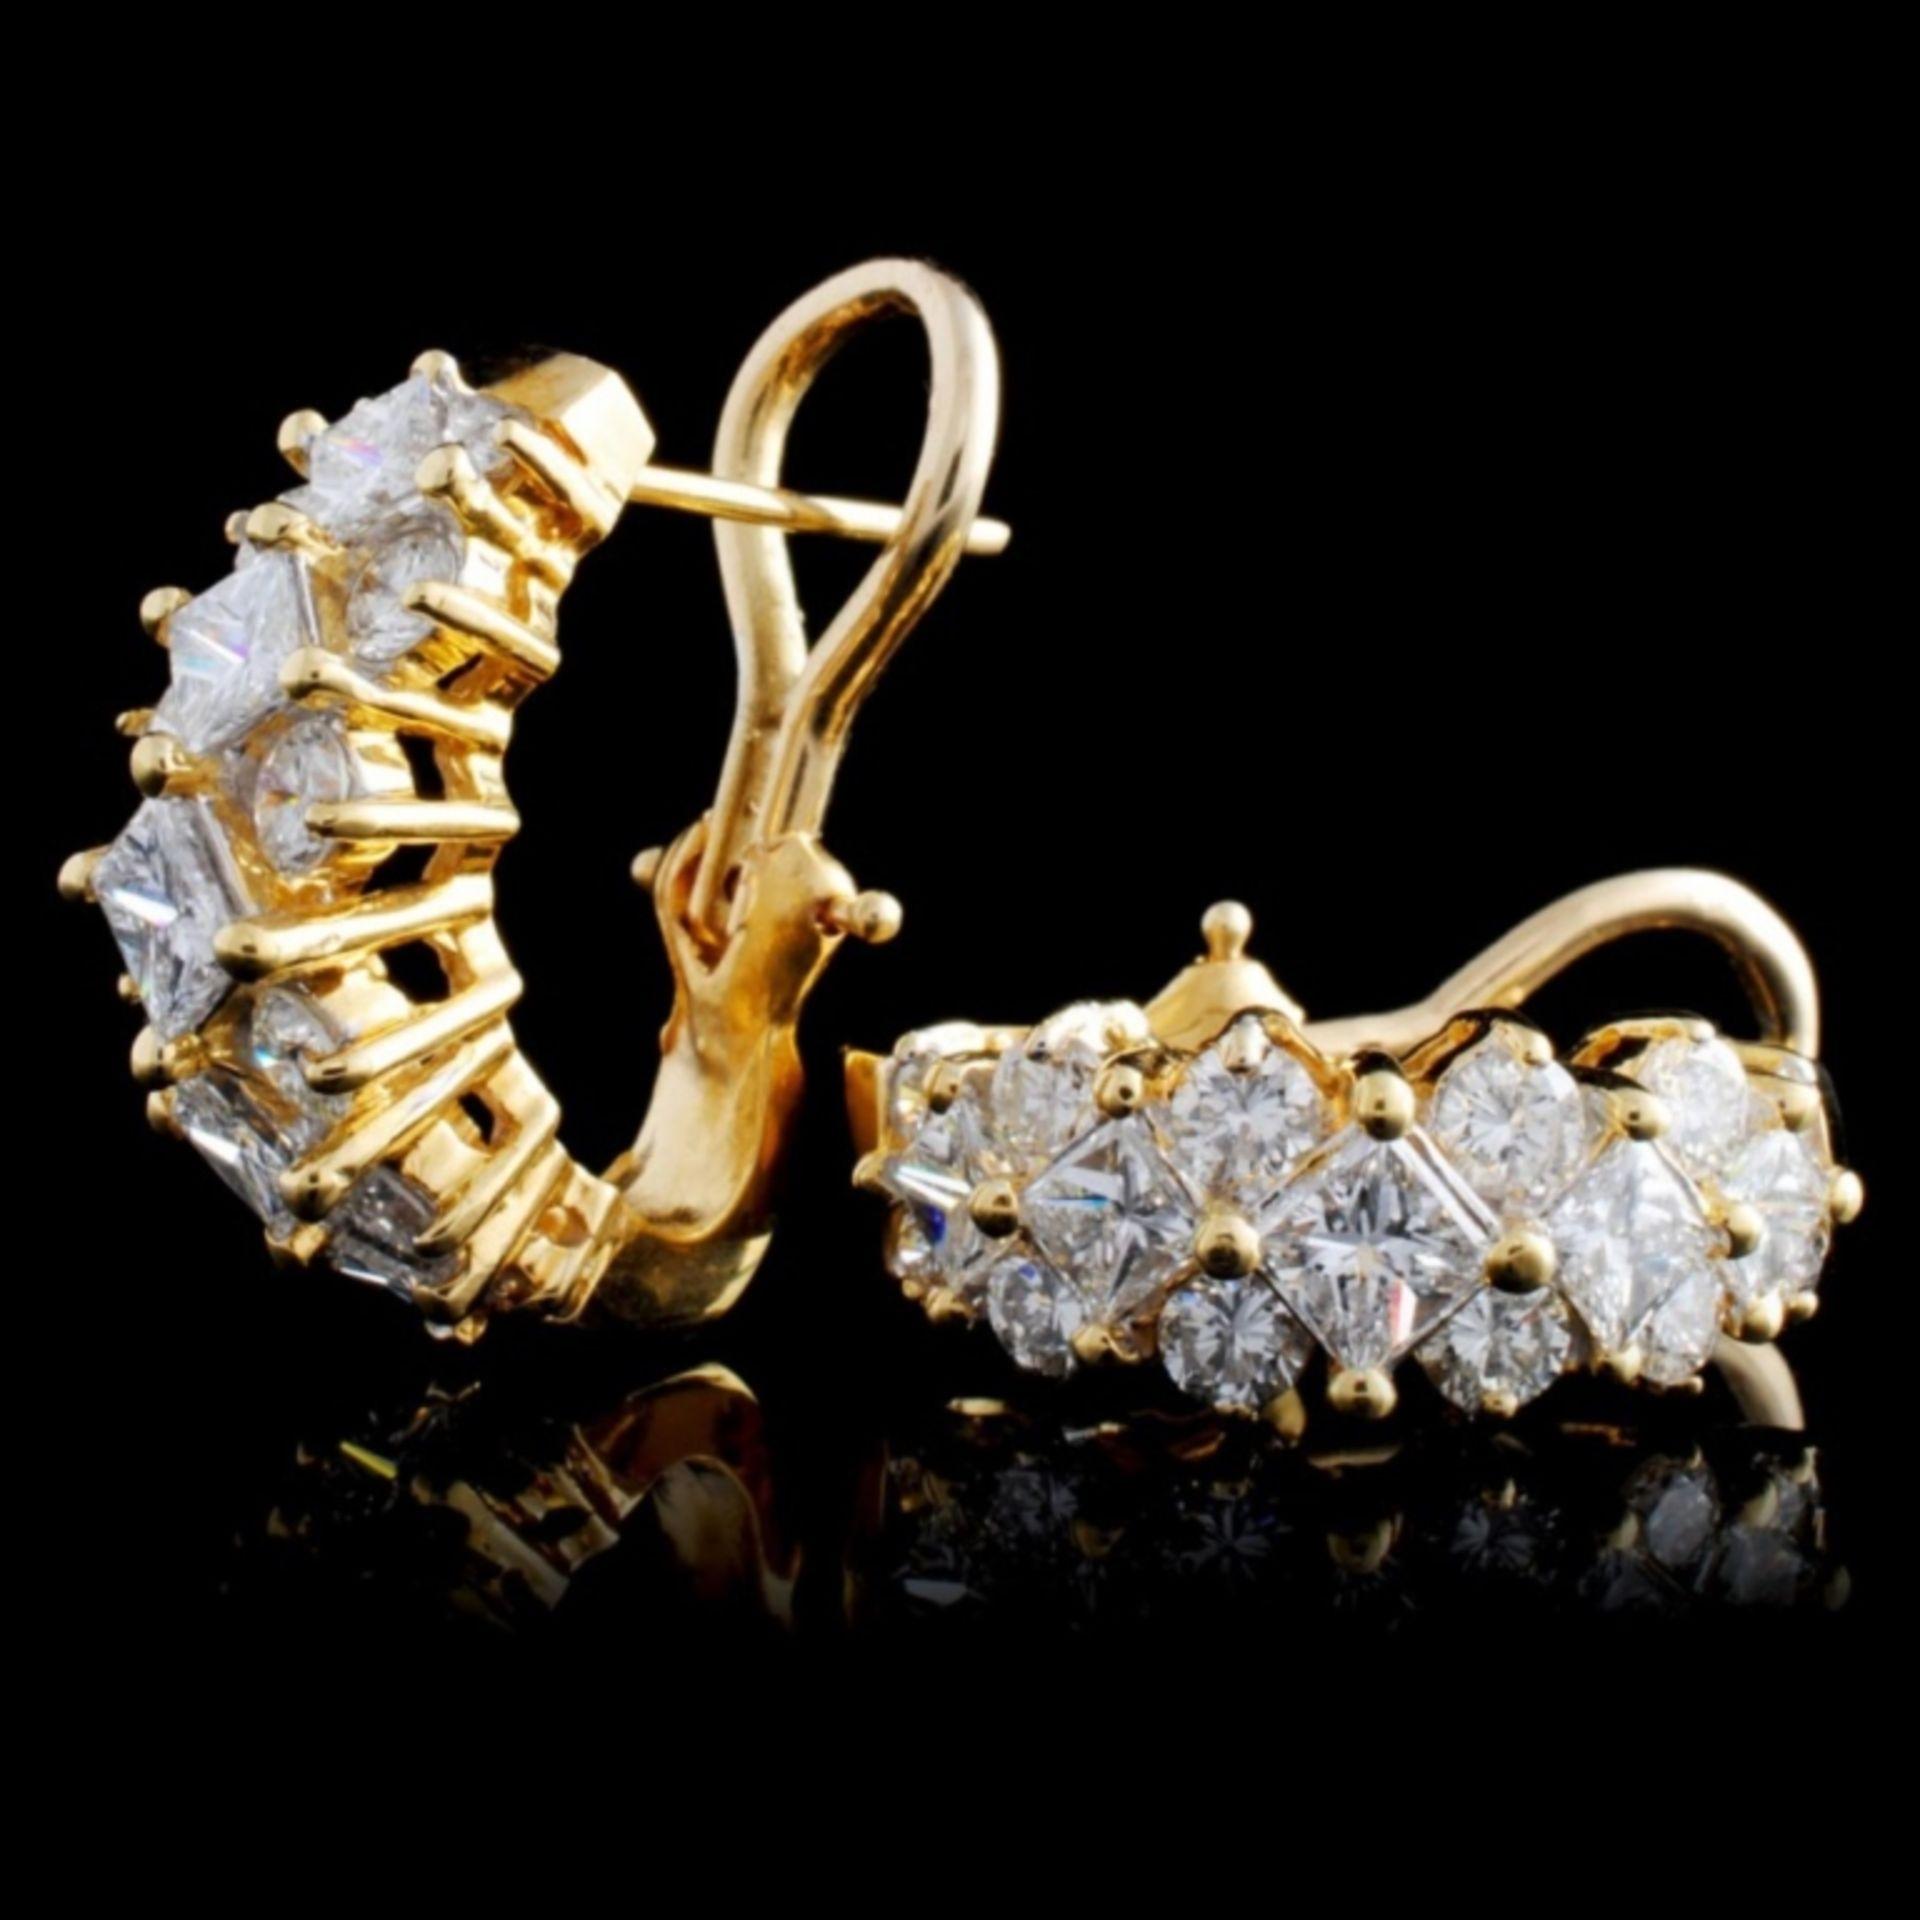 18K Yellow Gold 3.25ctw Diamond Earrings - Image 2 of 3